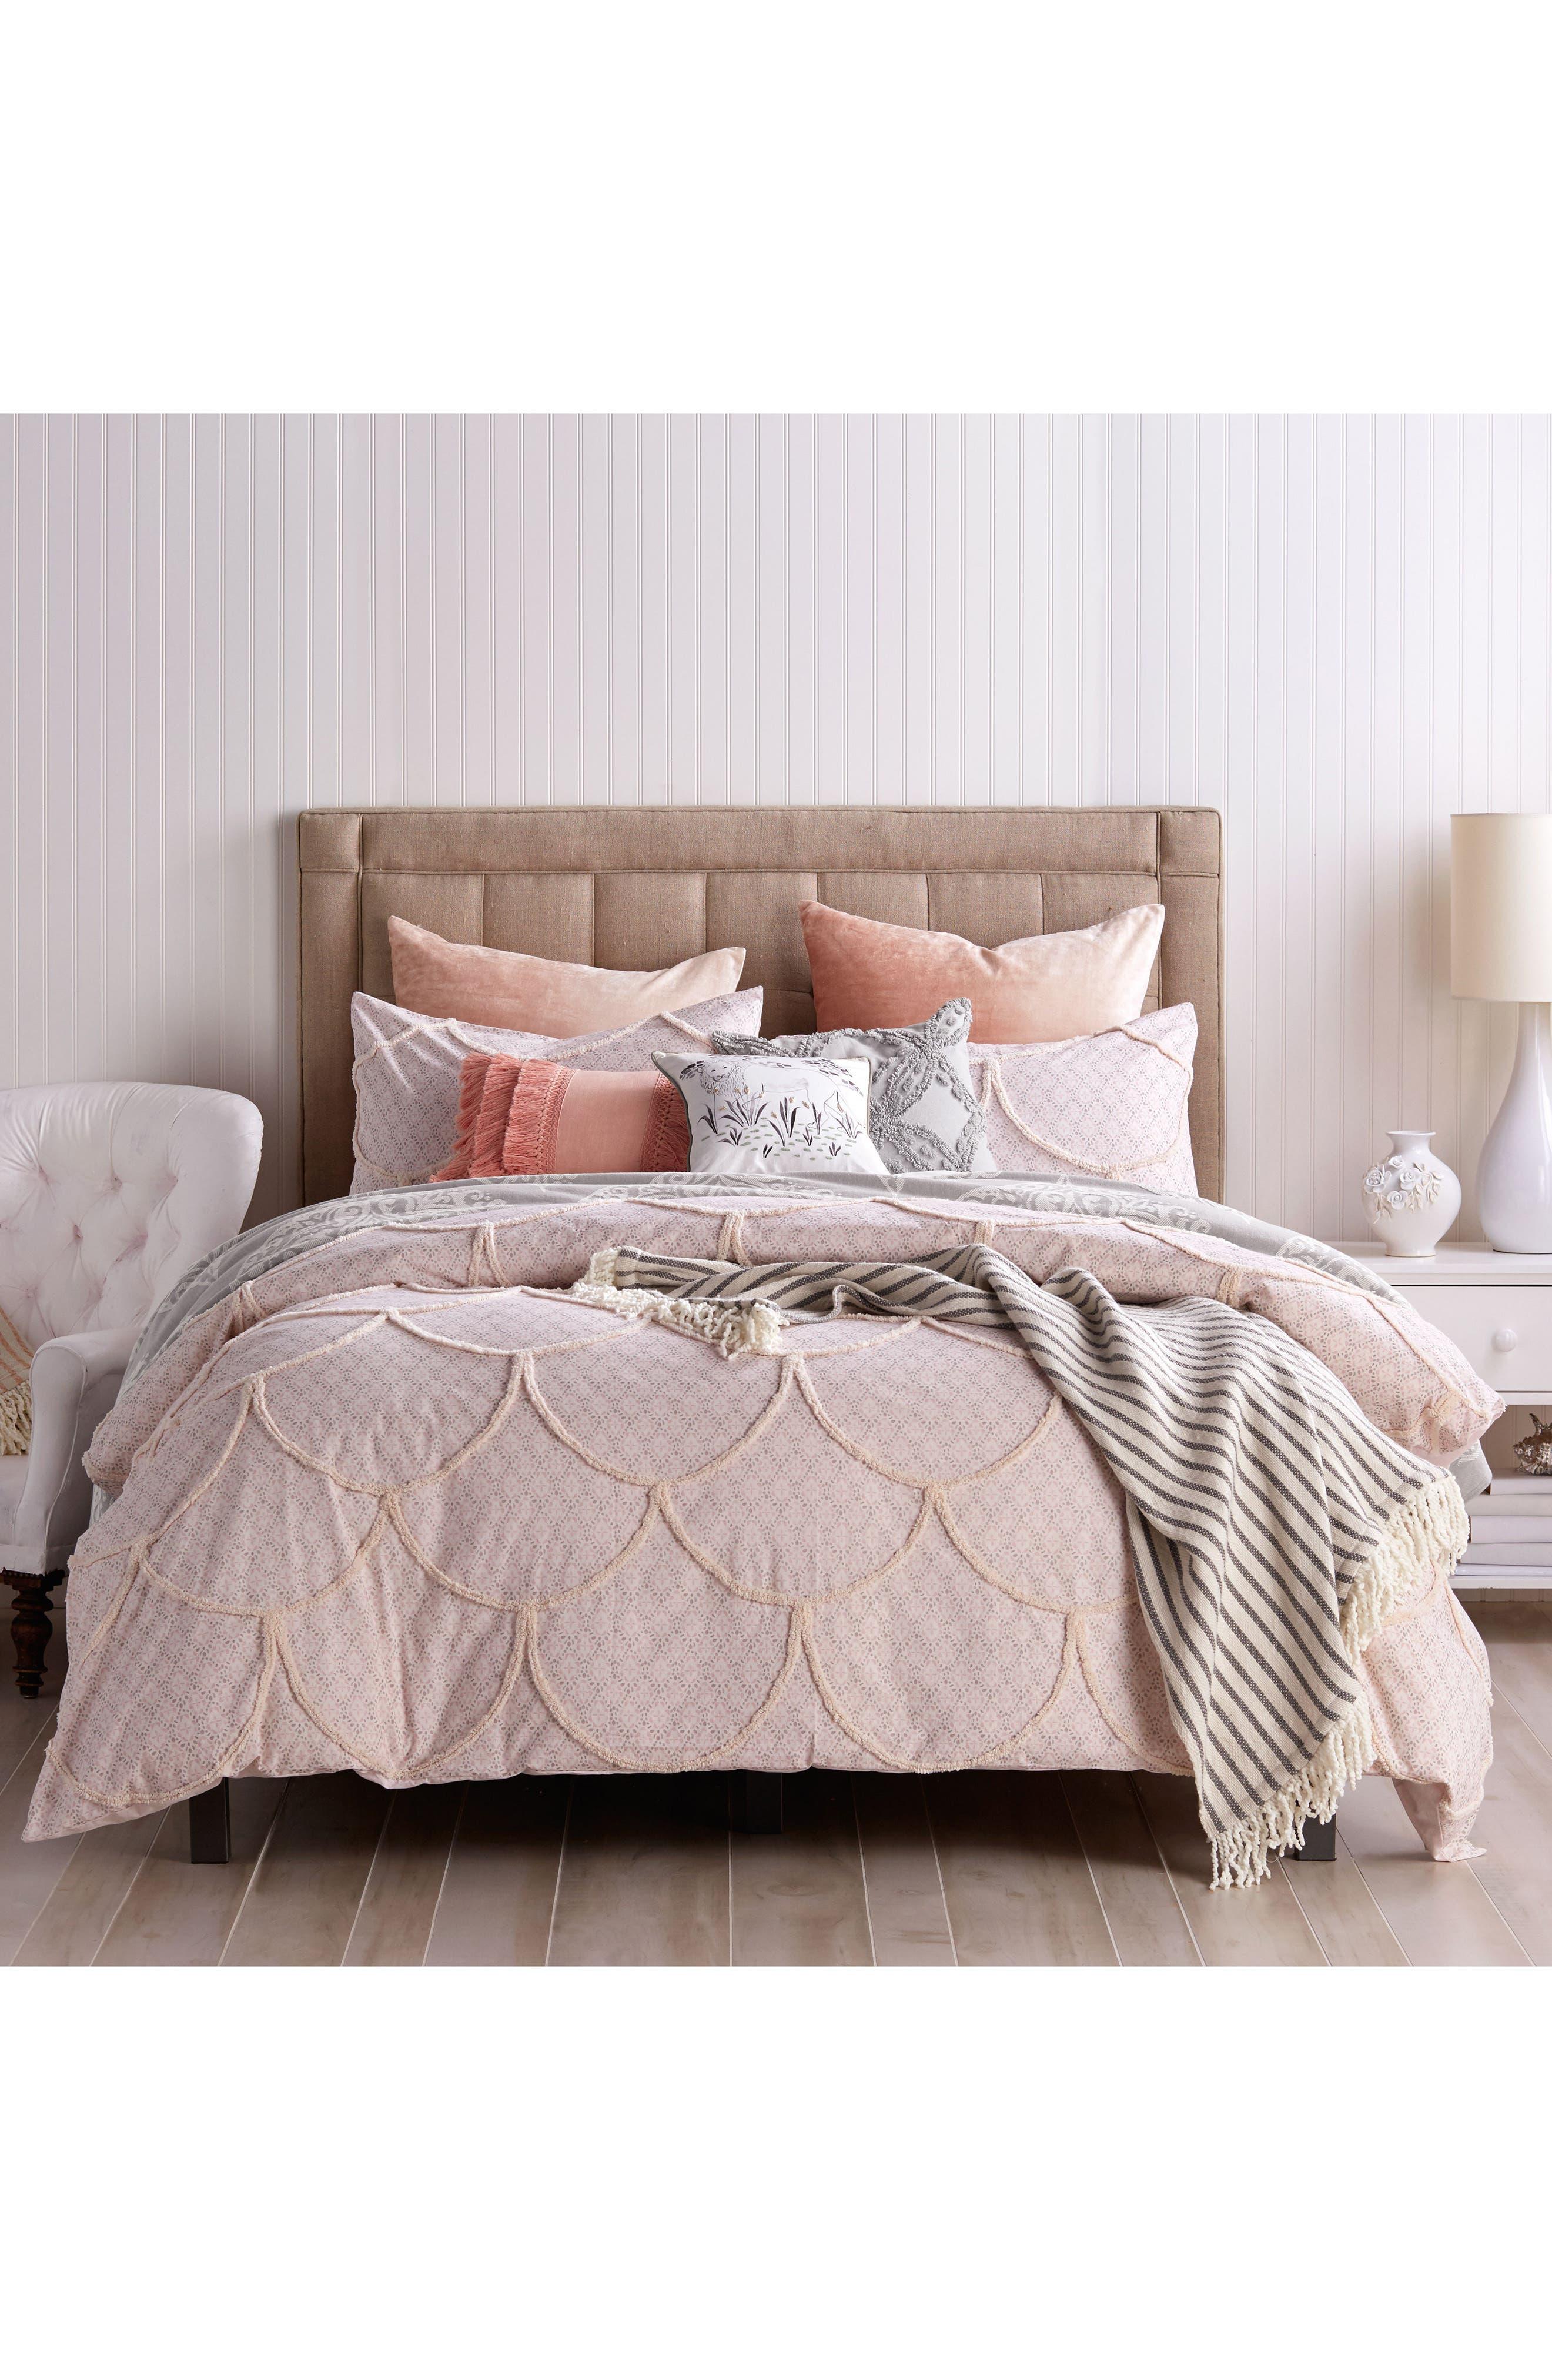 Chenille Scallop Comforter & Sham Set,                             Main thumbnail 1, color,                             Blush